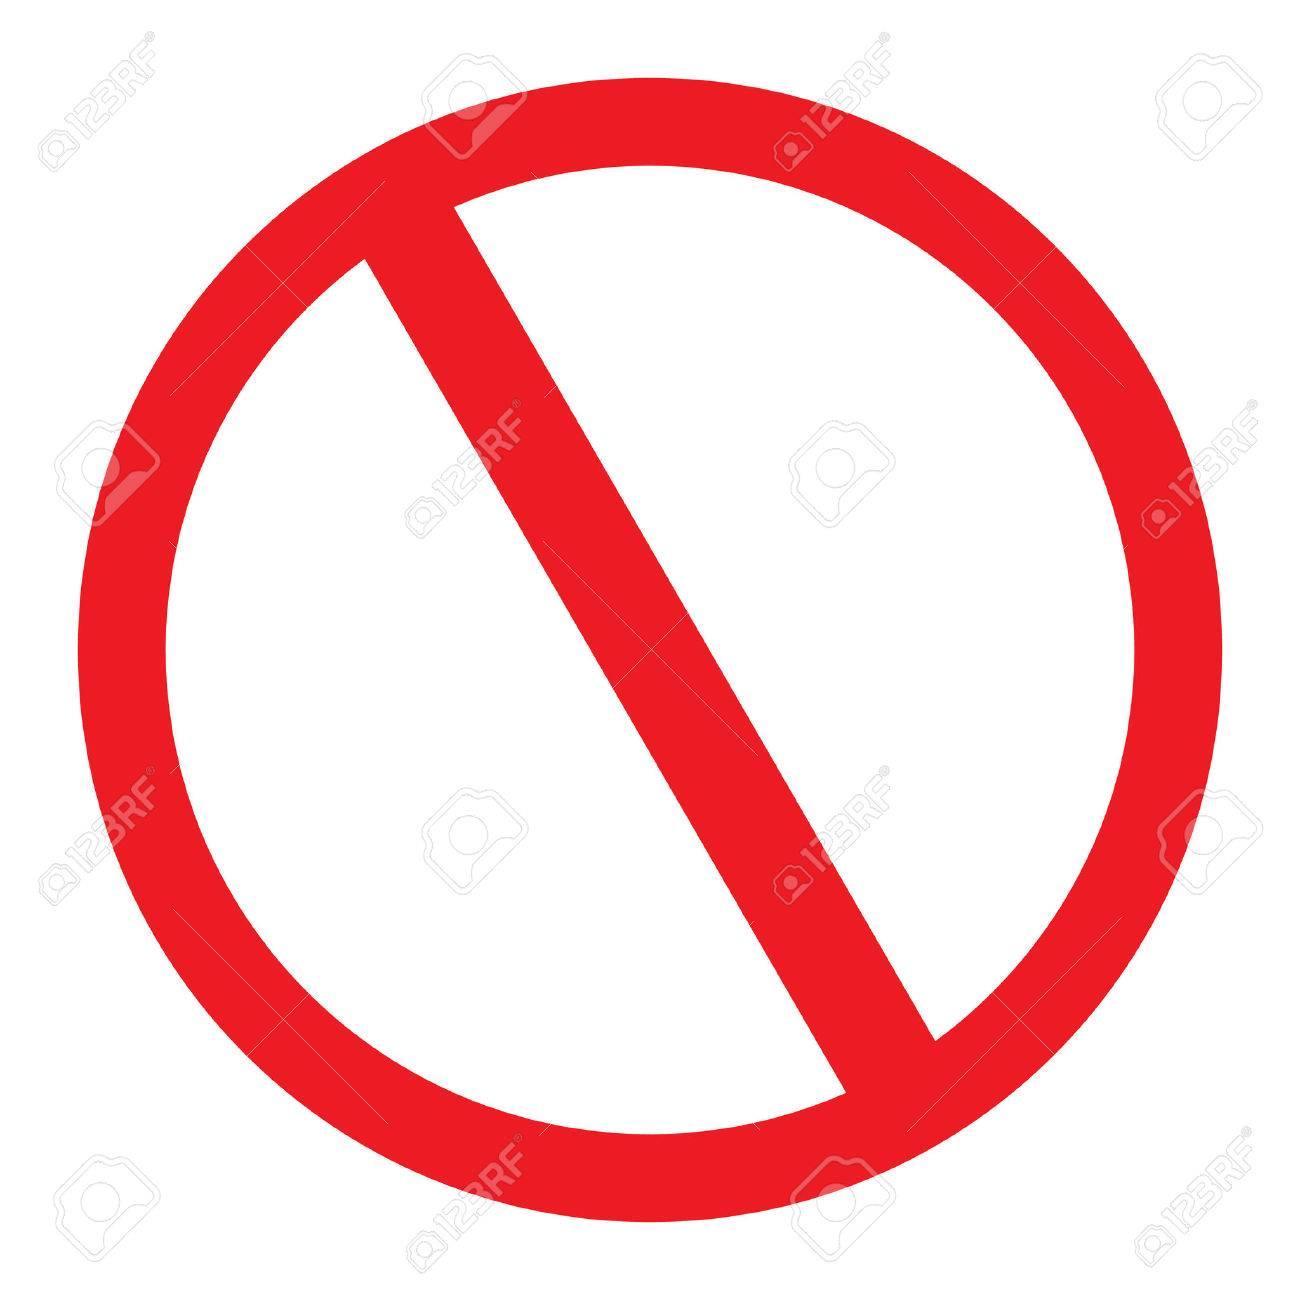 No Sign blank vector icon - 58343925